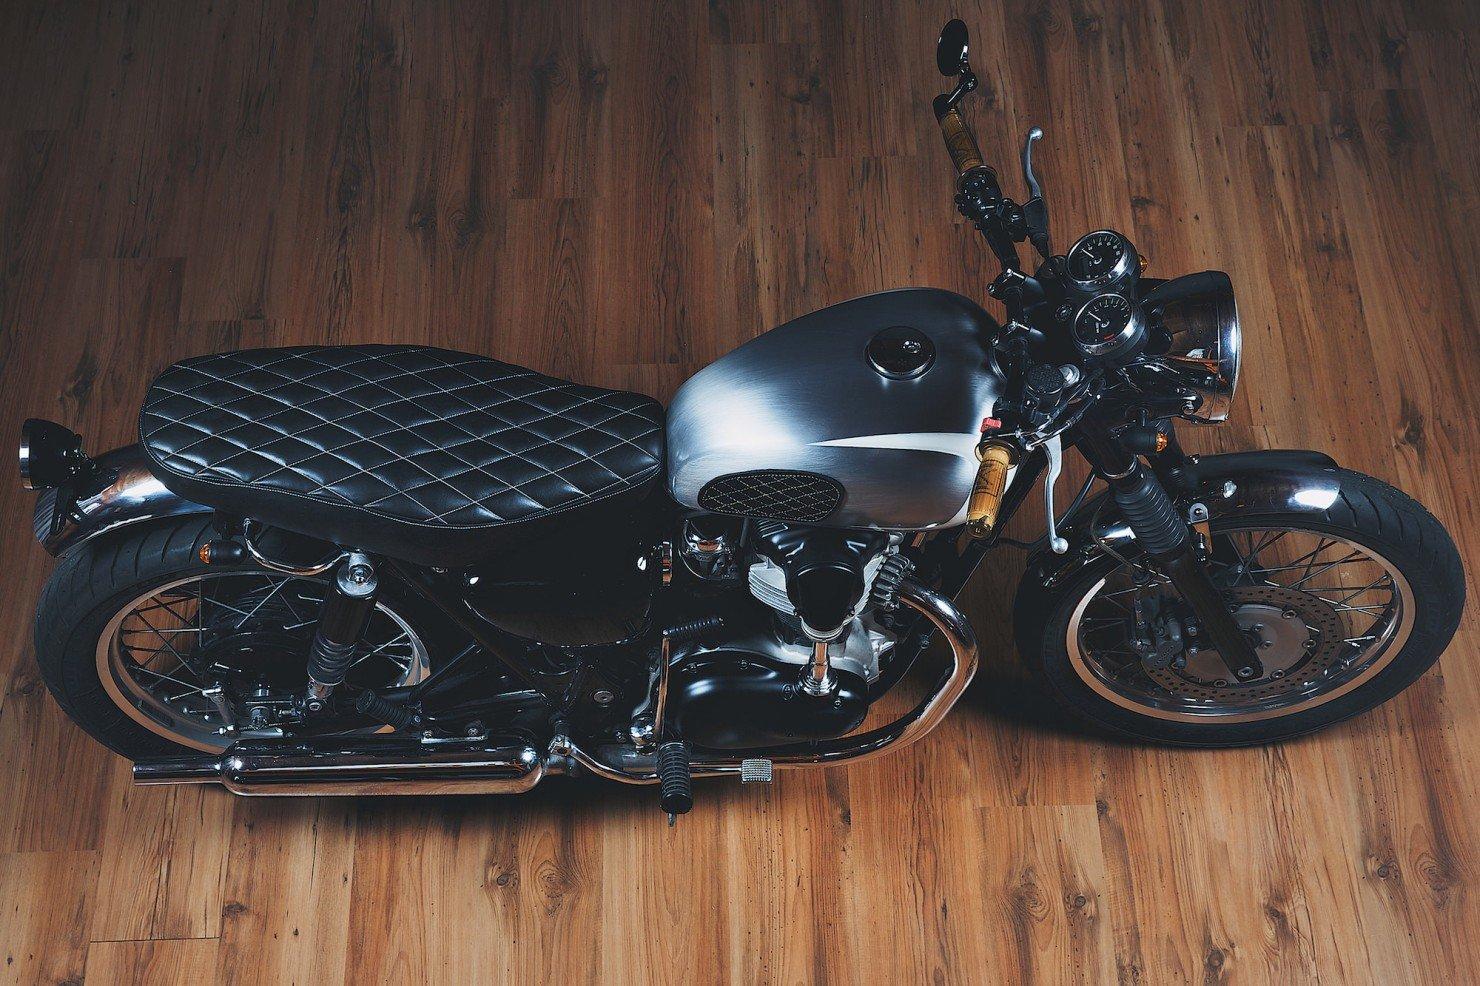 Kawasaki W650 Motorcycle 19 1480x986 Kawasaki W650